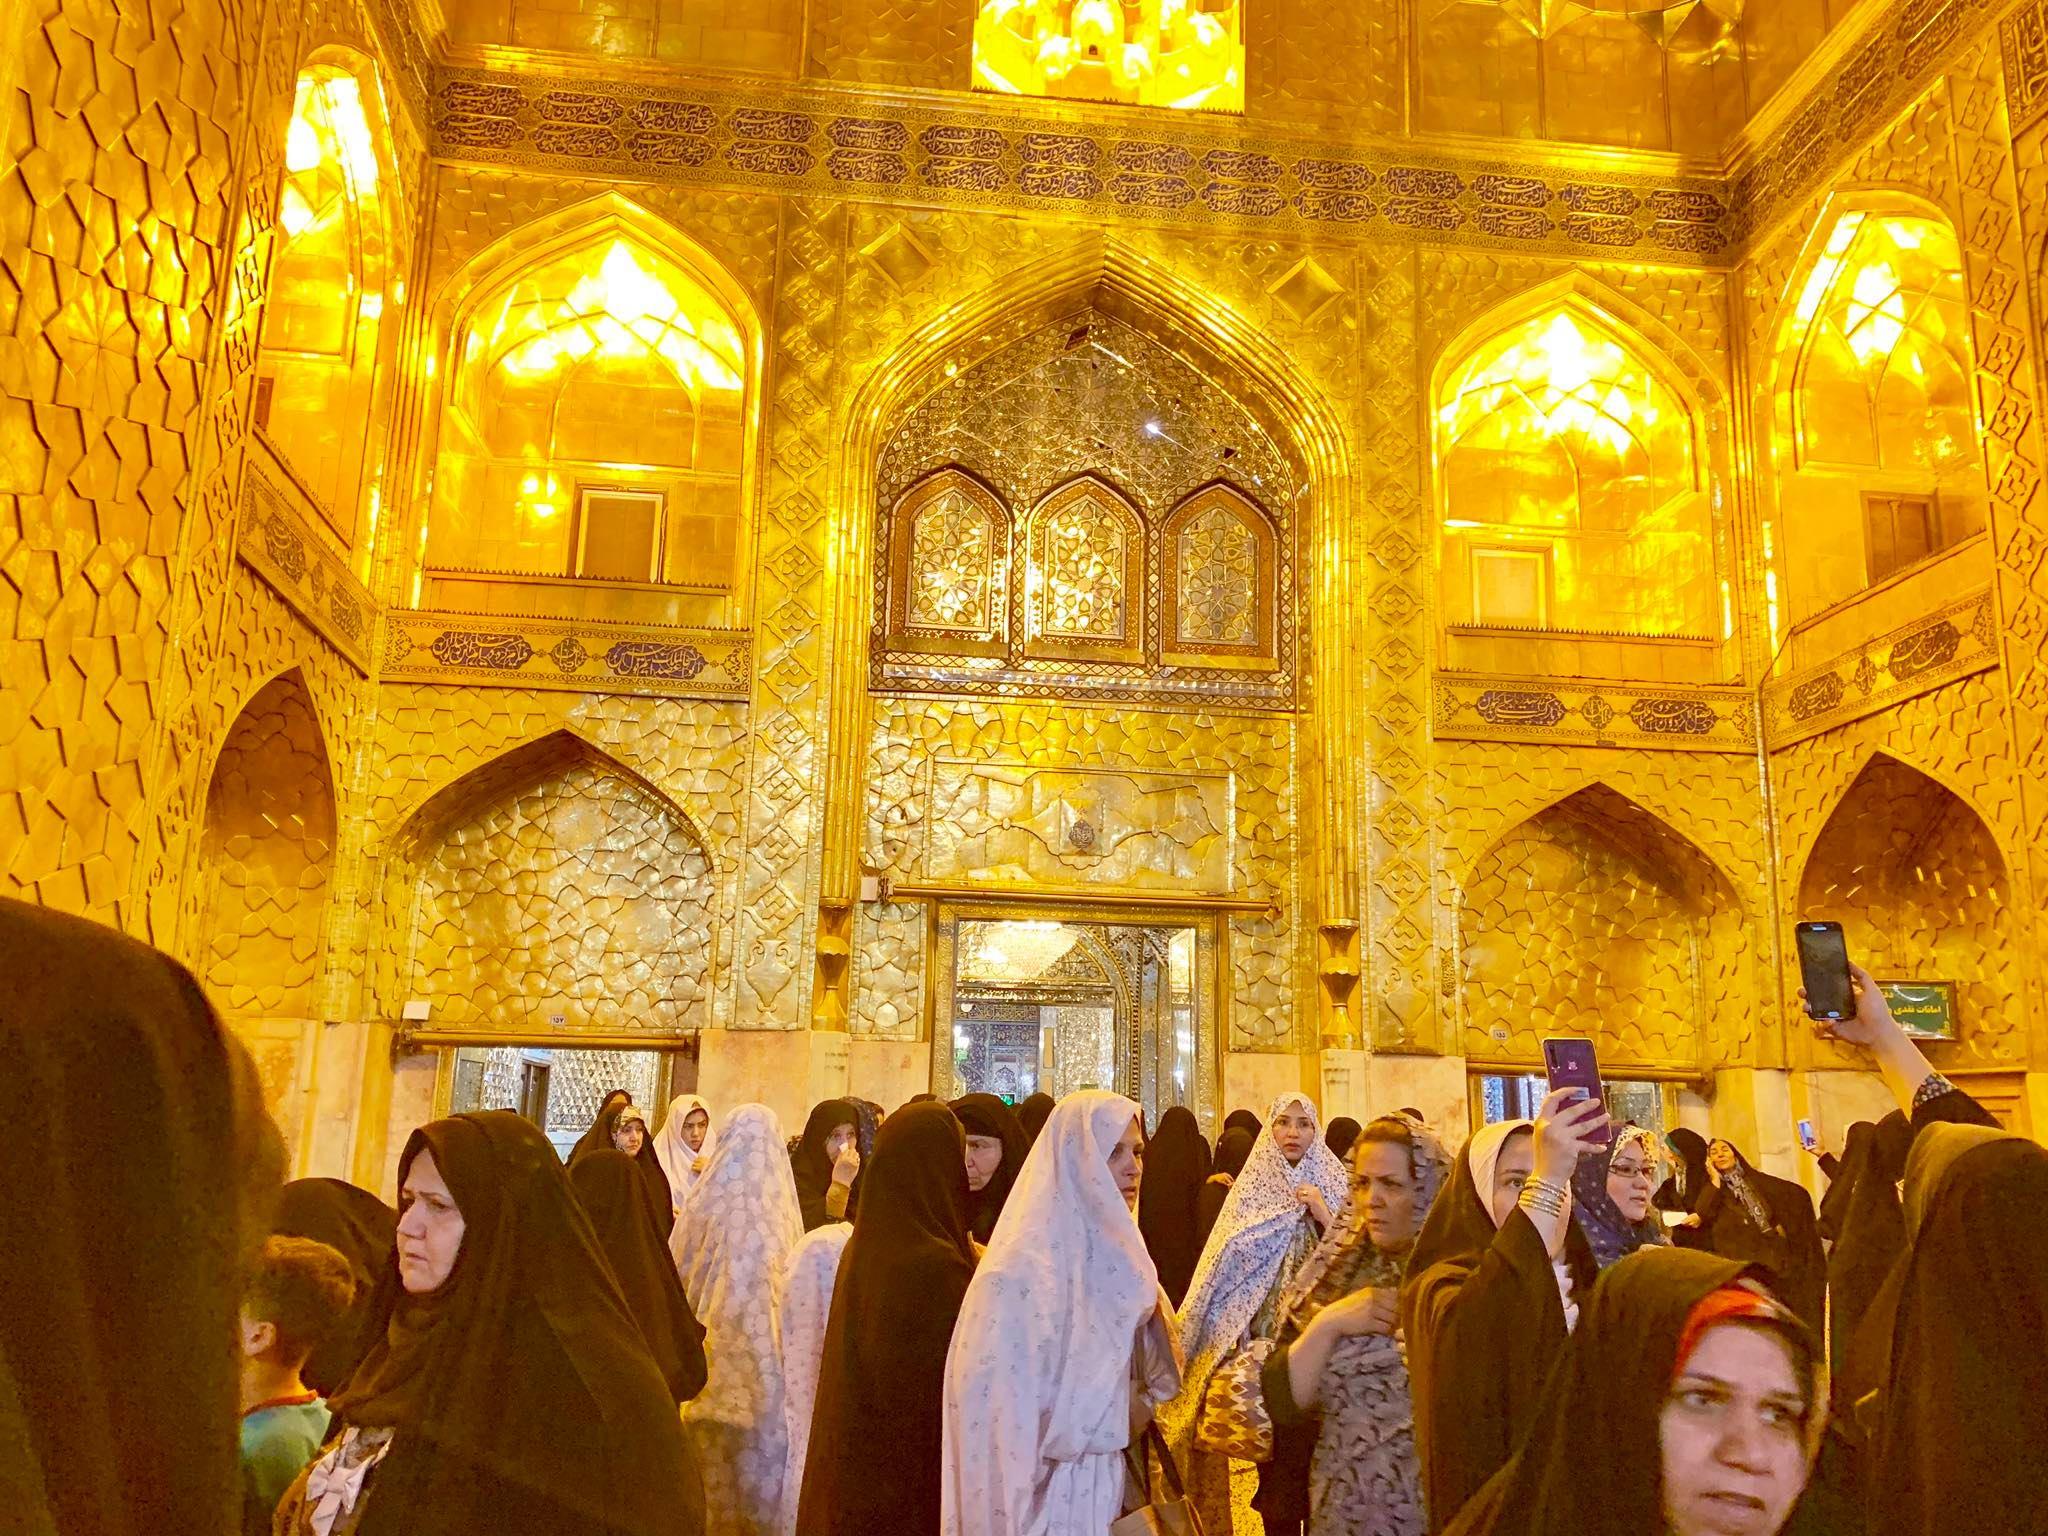 Kach Solo Travels in 2019 Overnight in Mashhad4.jpg